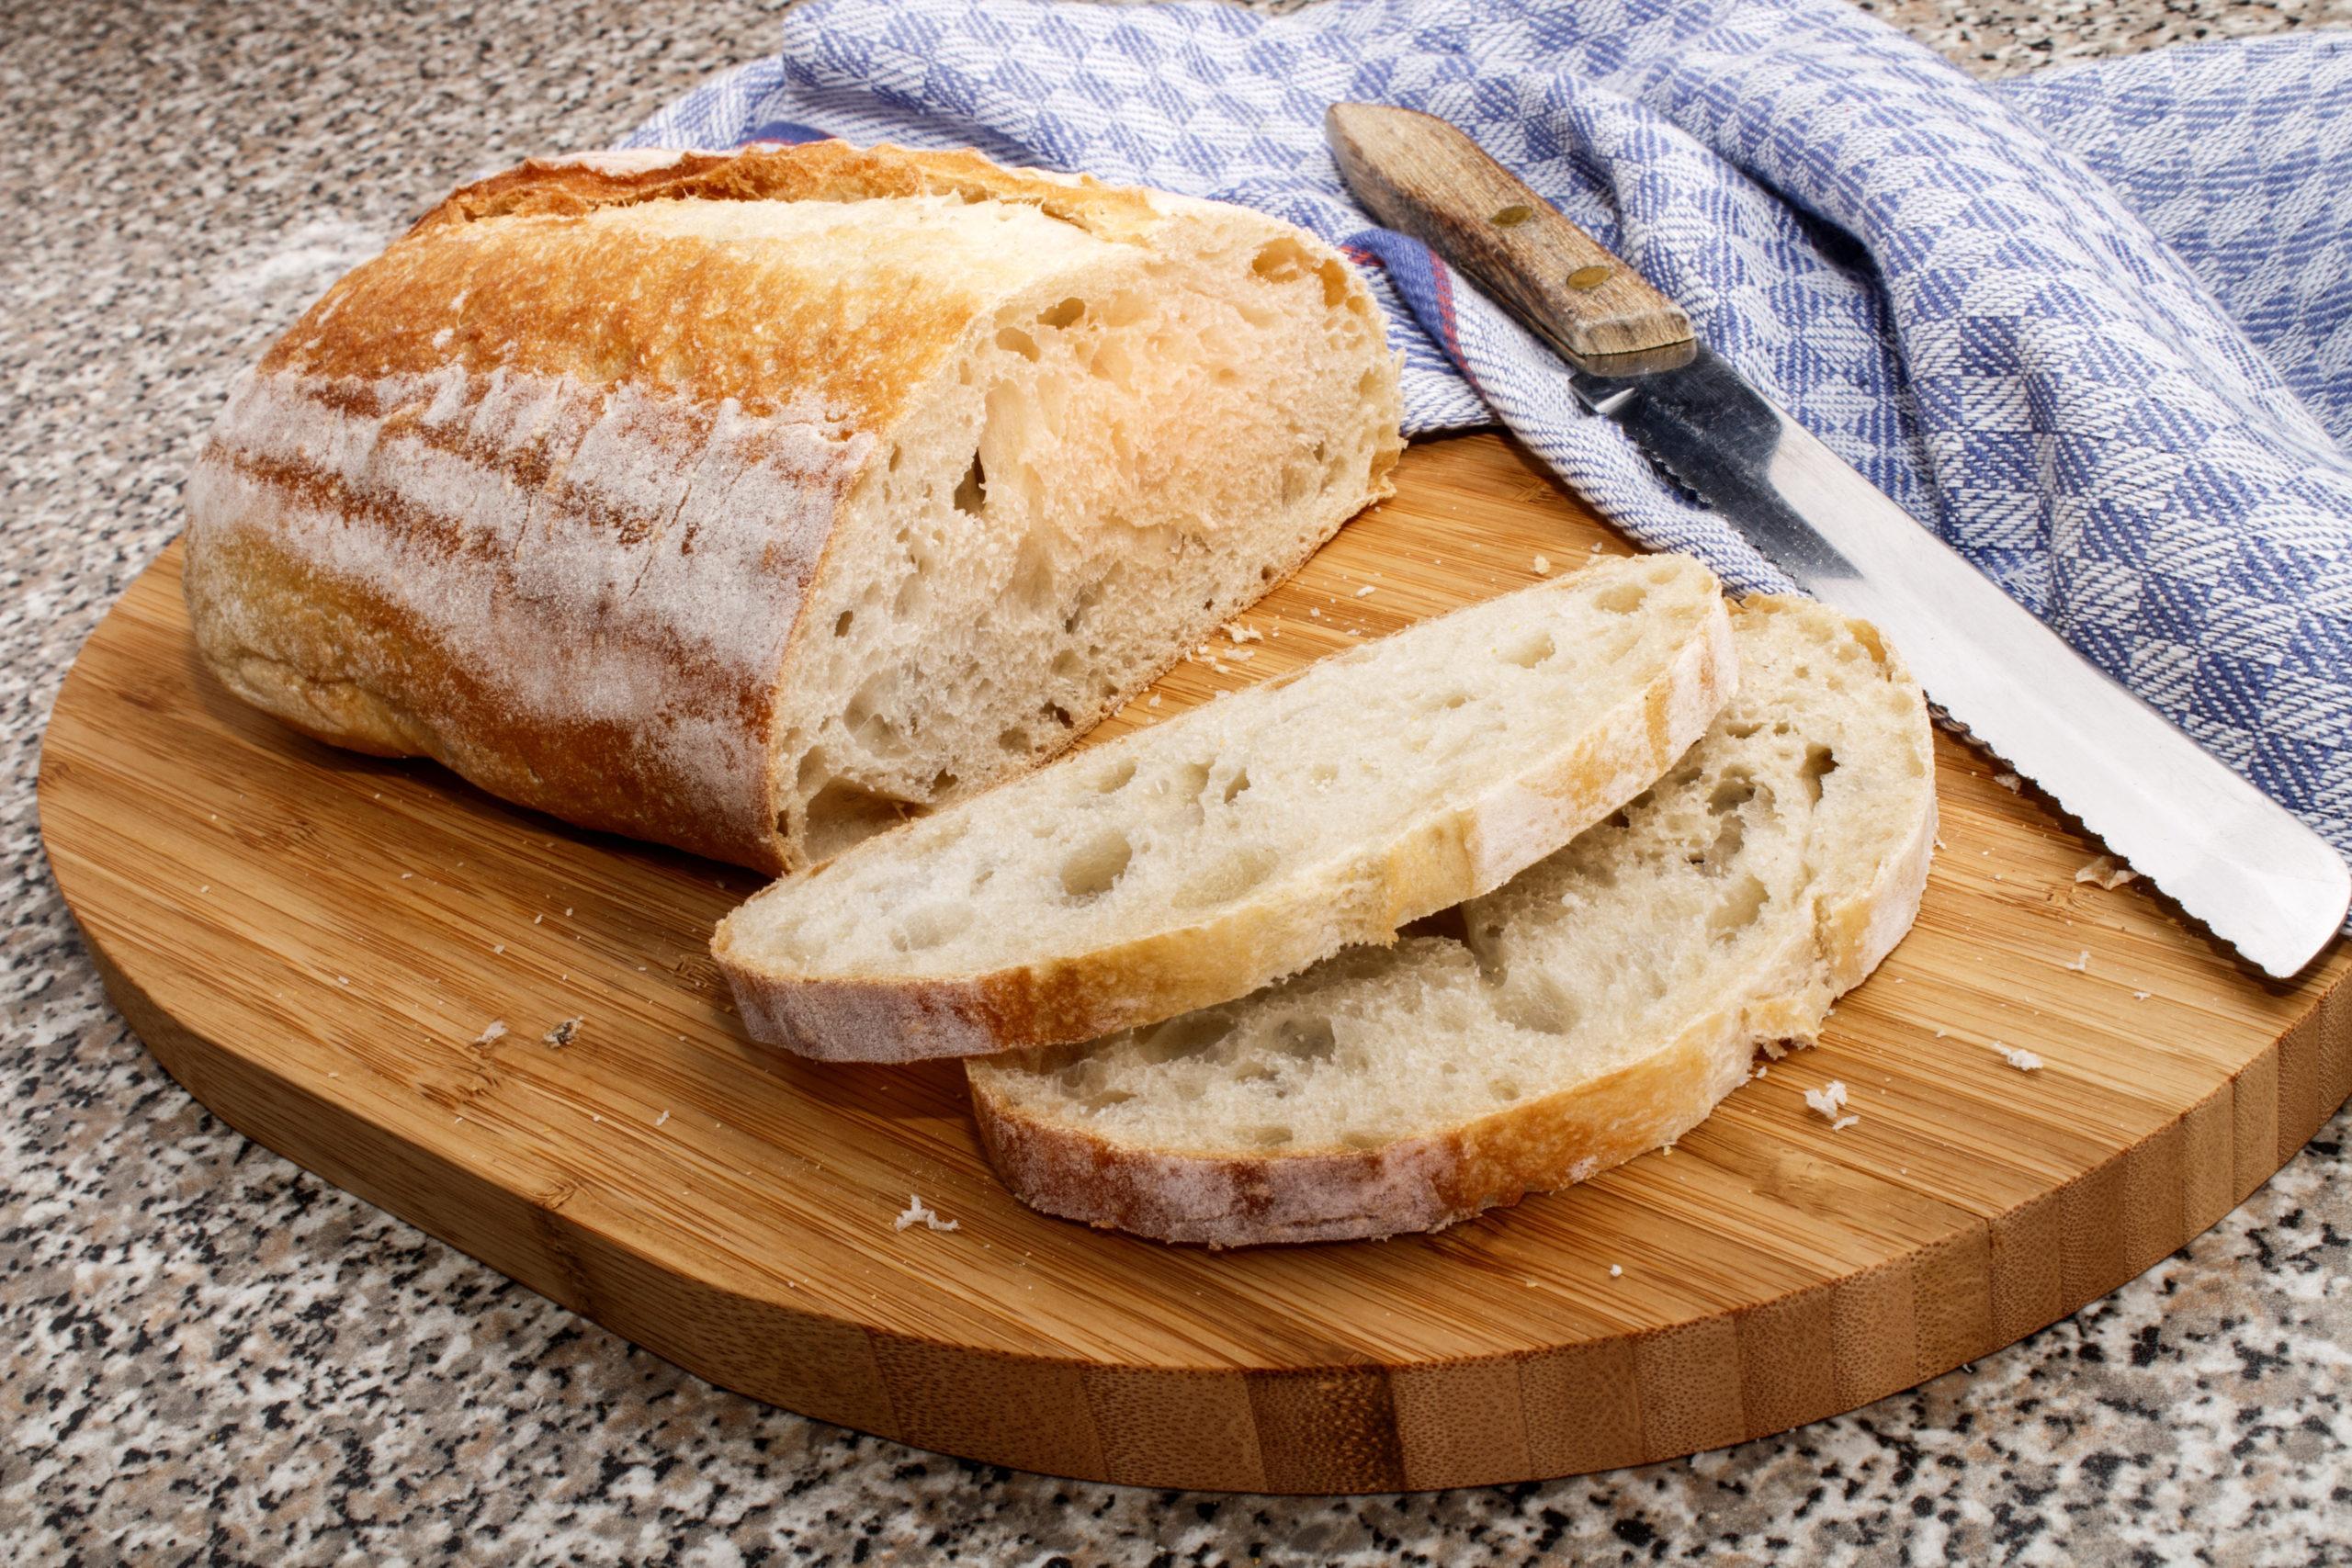 Sliced fresh sourdough bread on a bread board with knife